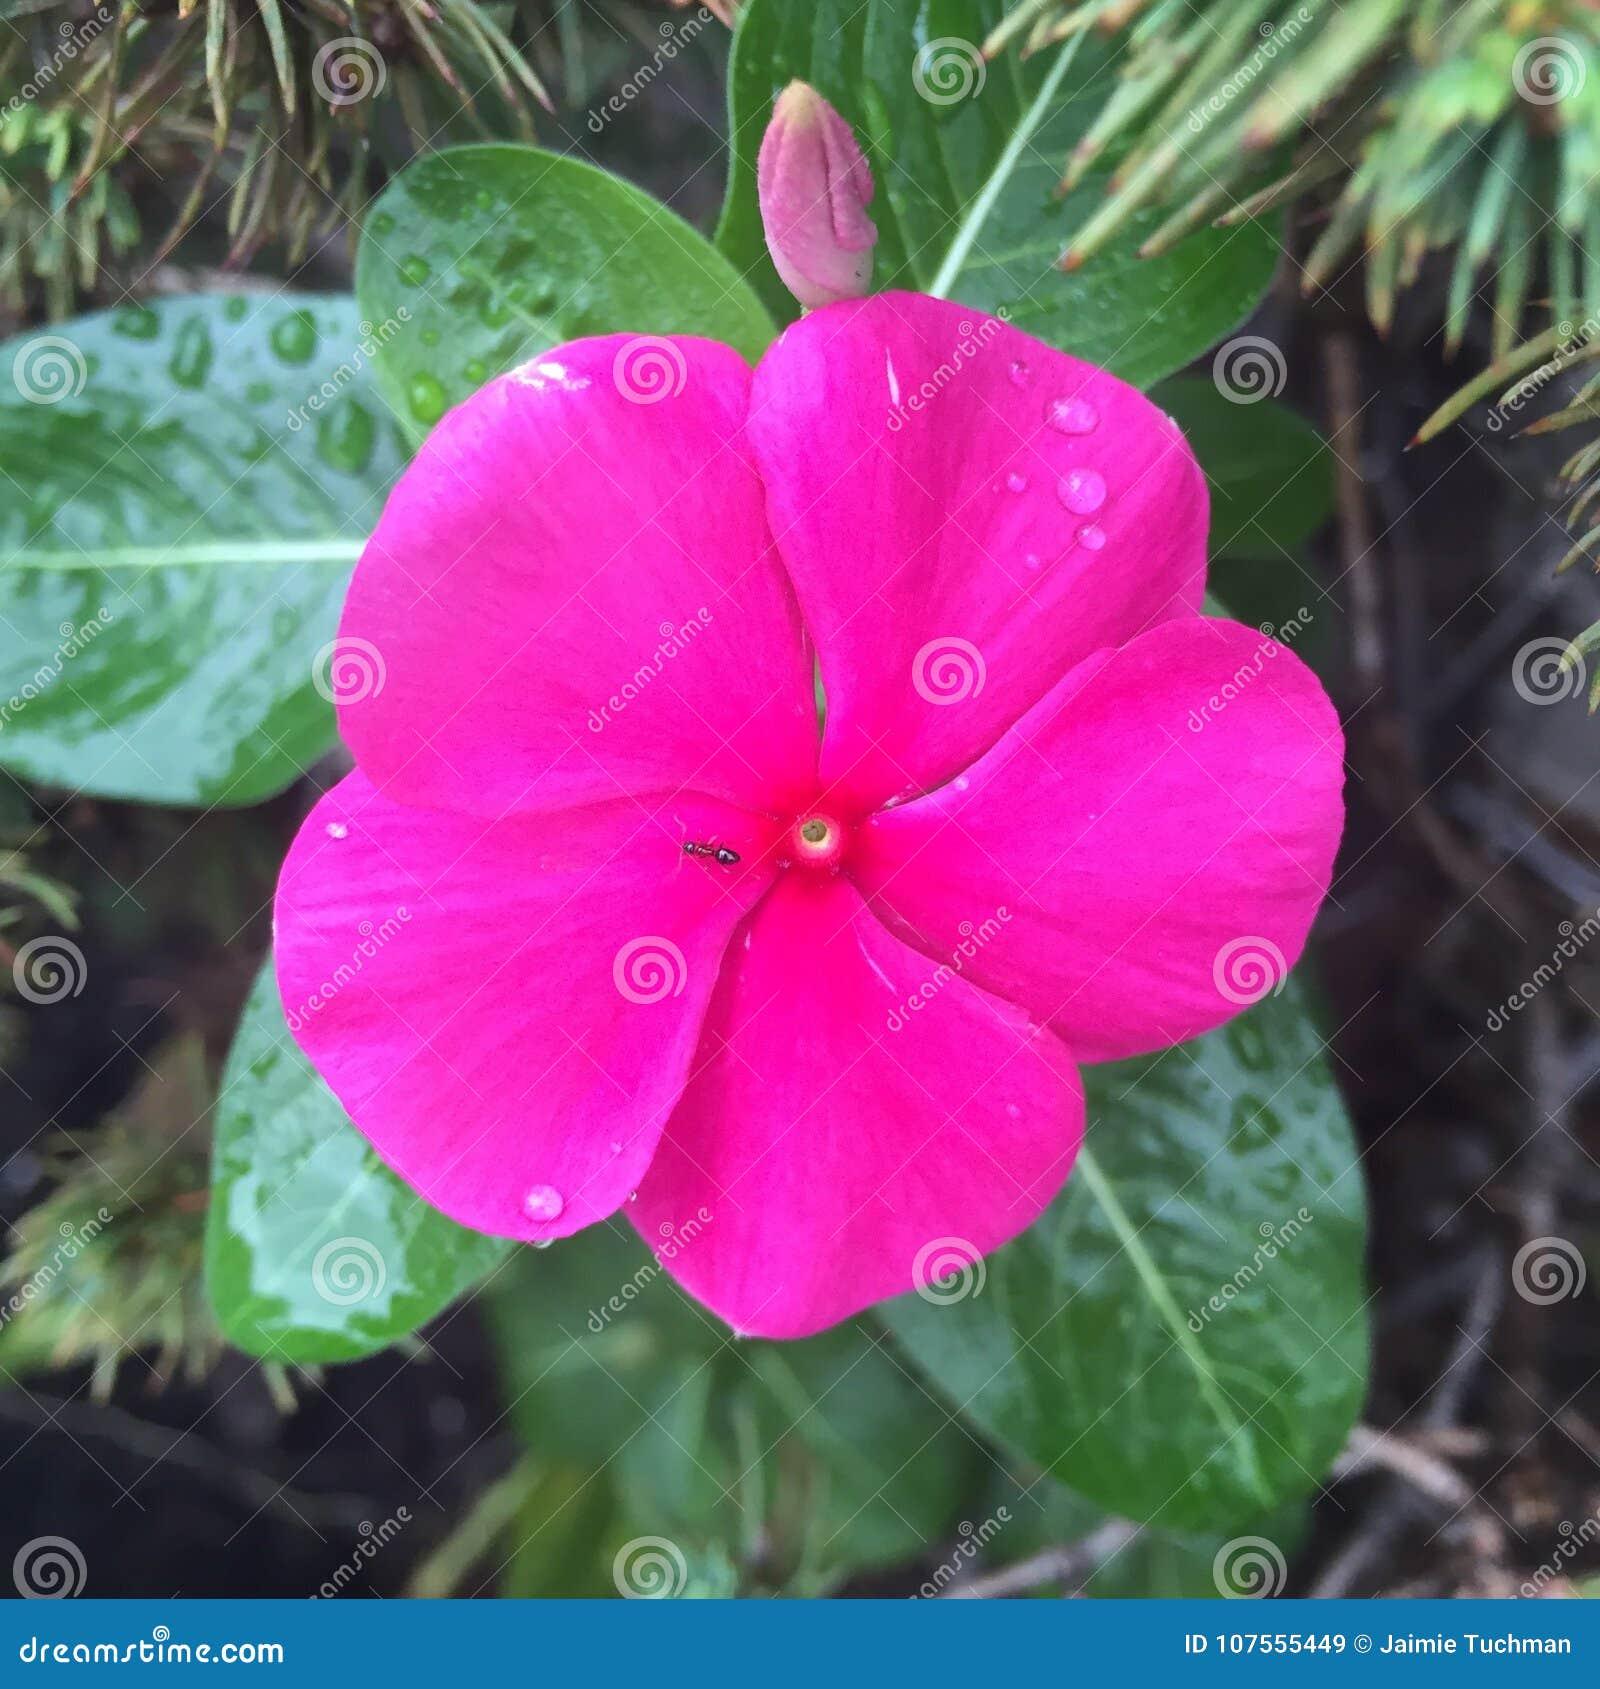 Fourmi sur la fleur